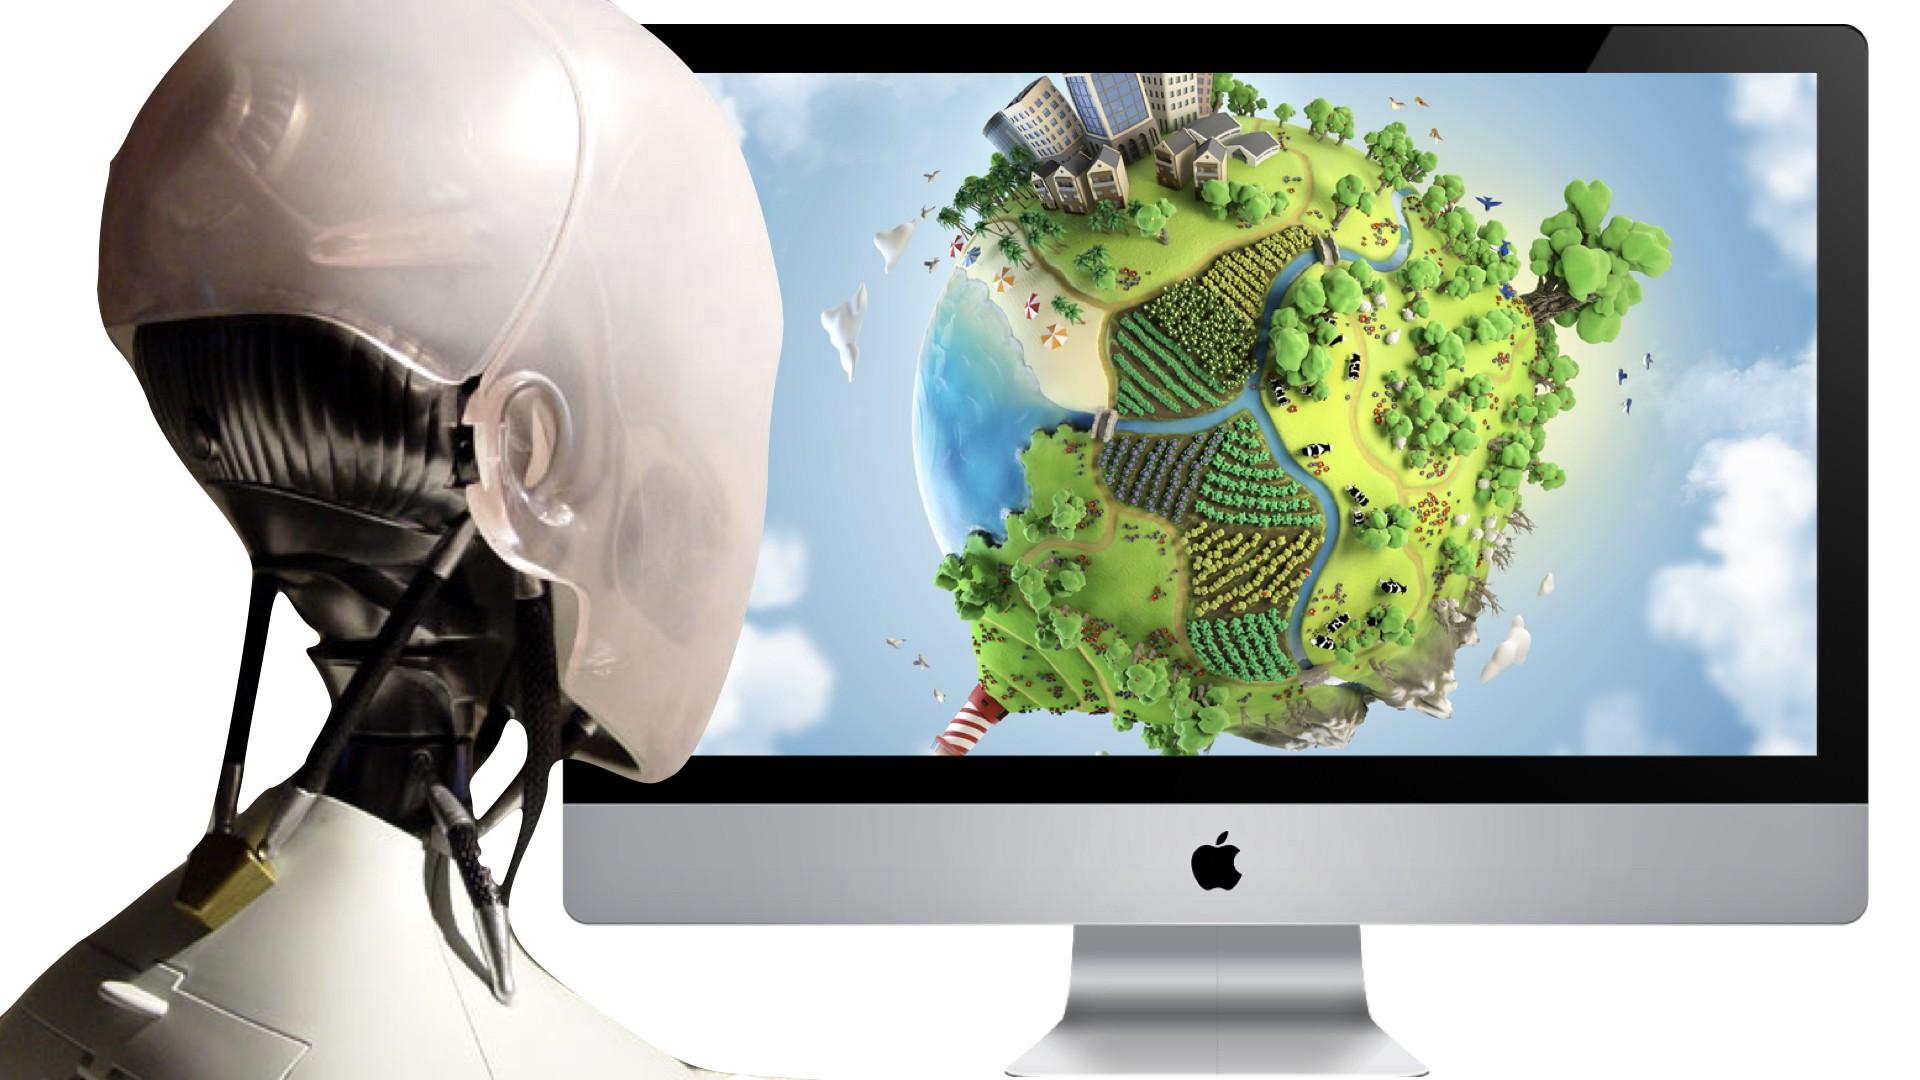 هوش مصنوعی و تاثیرات اجتماعی آن